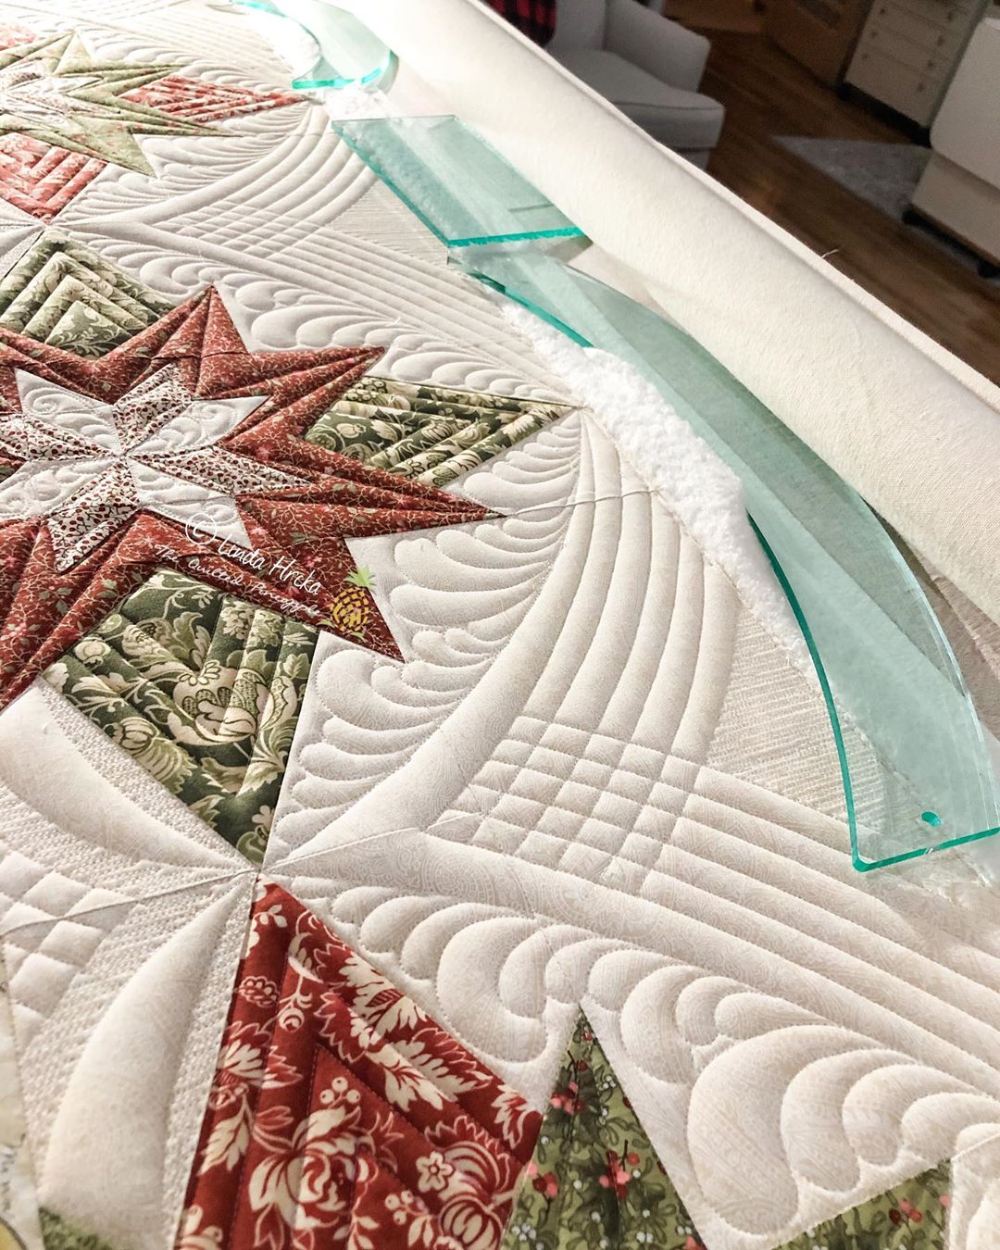 Instagram In 2020 Free Motion Quilt Designs Longarm Quilting Designs Machine Quilting Designs